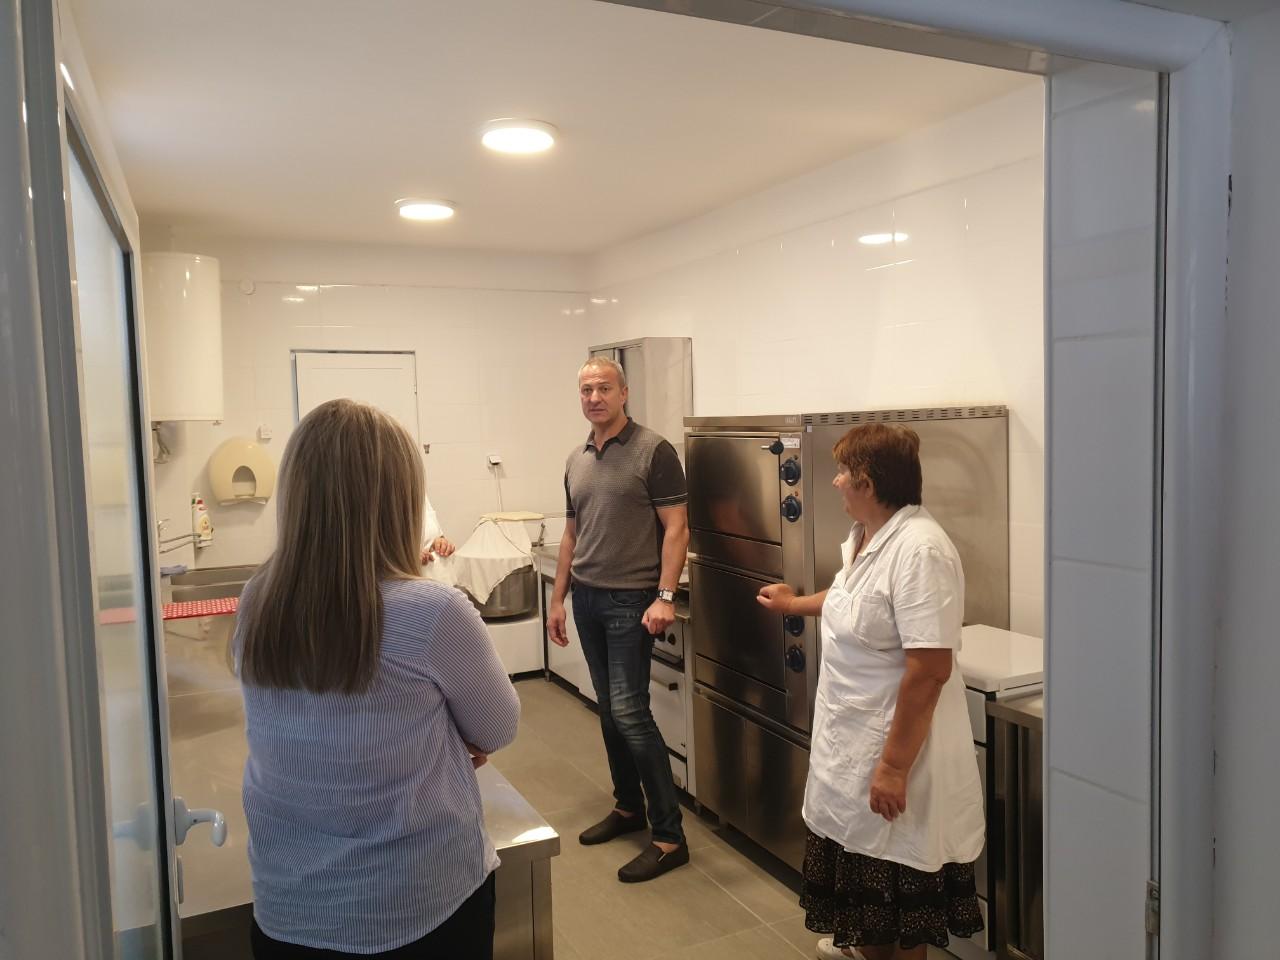 Obilazak kuhinje, foto: M.N.